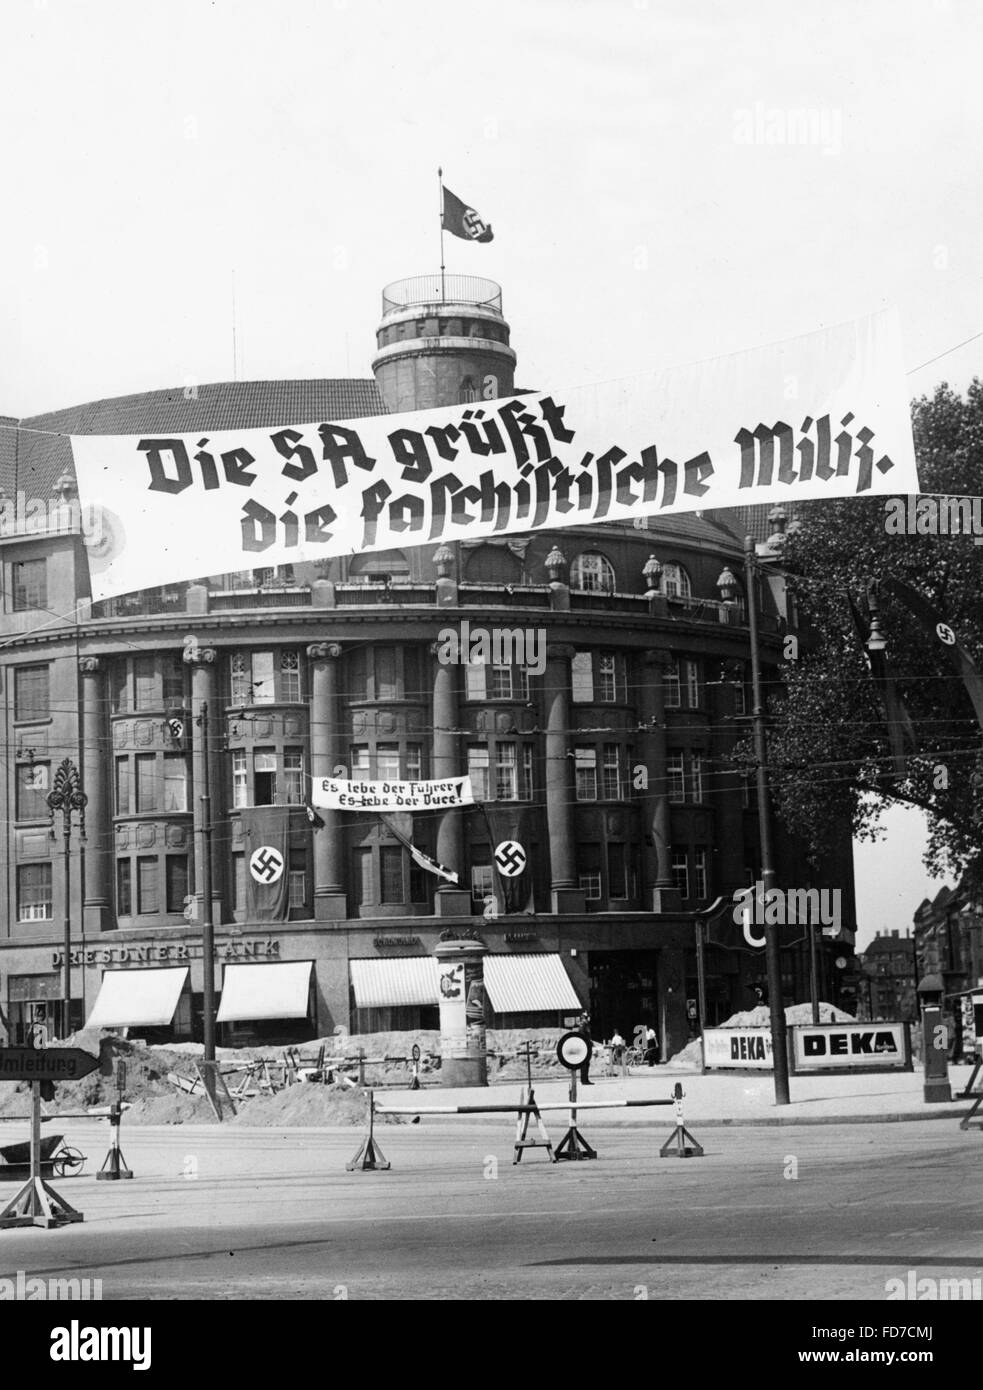 Visit of the Italian fascist militia in Berlin, 1938 - Stock Image